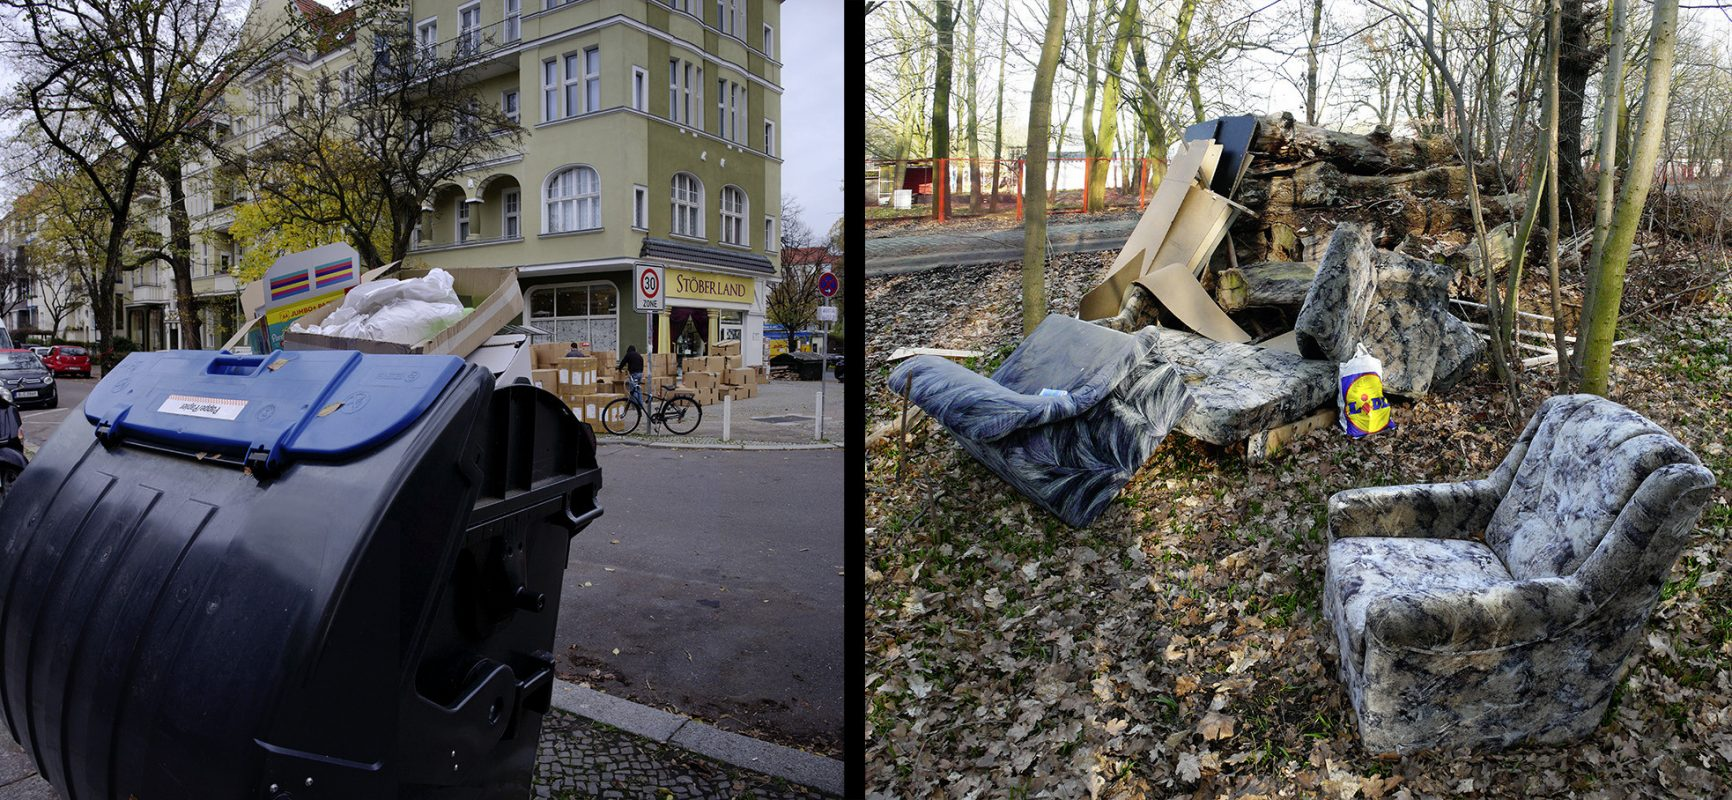 Berlin Friedenau, Treptower Park, alte Möbel, Abfall